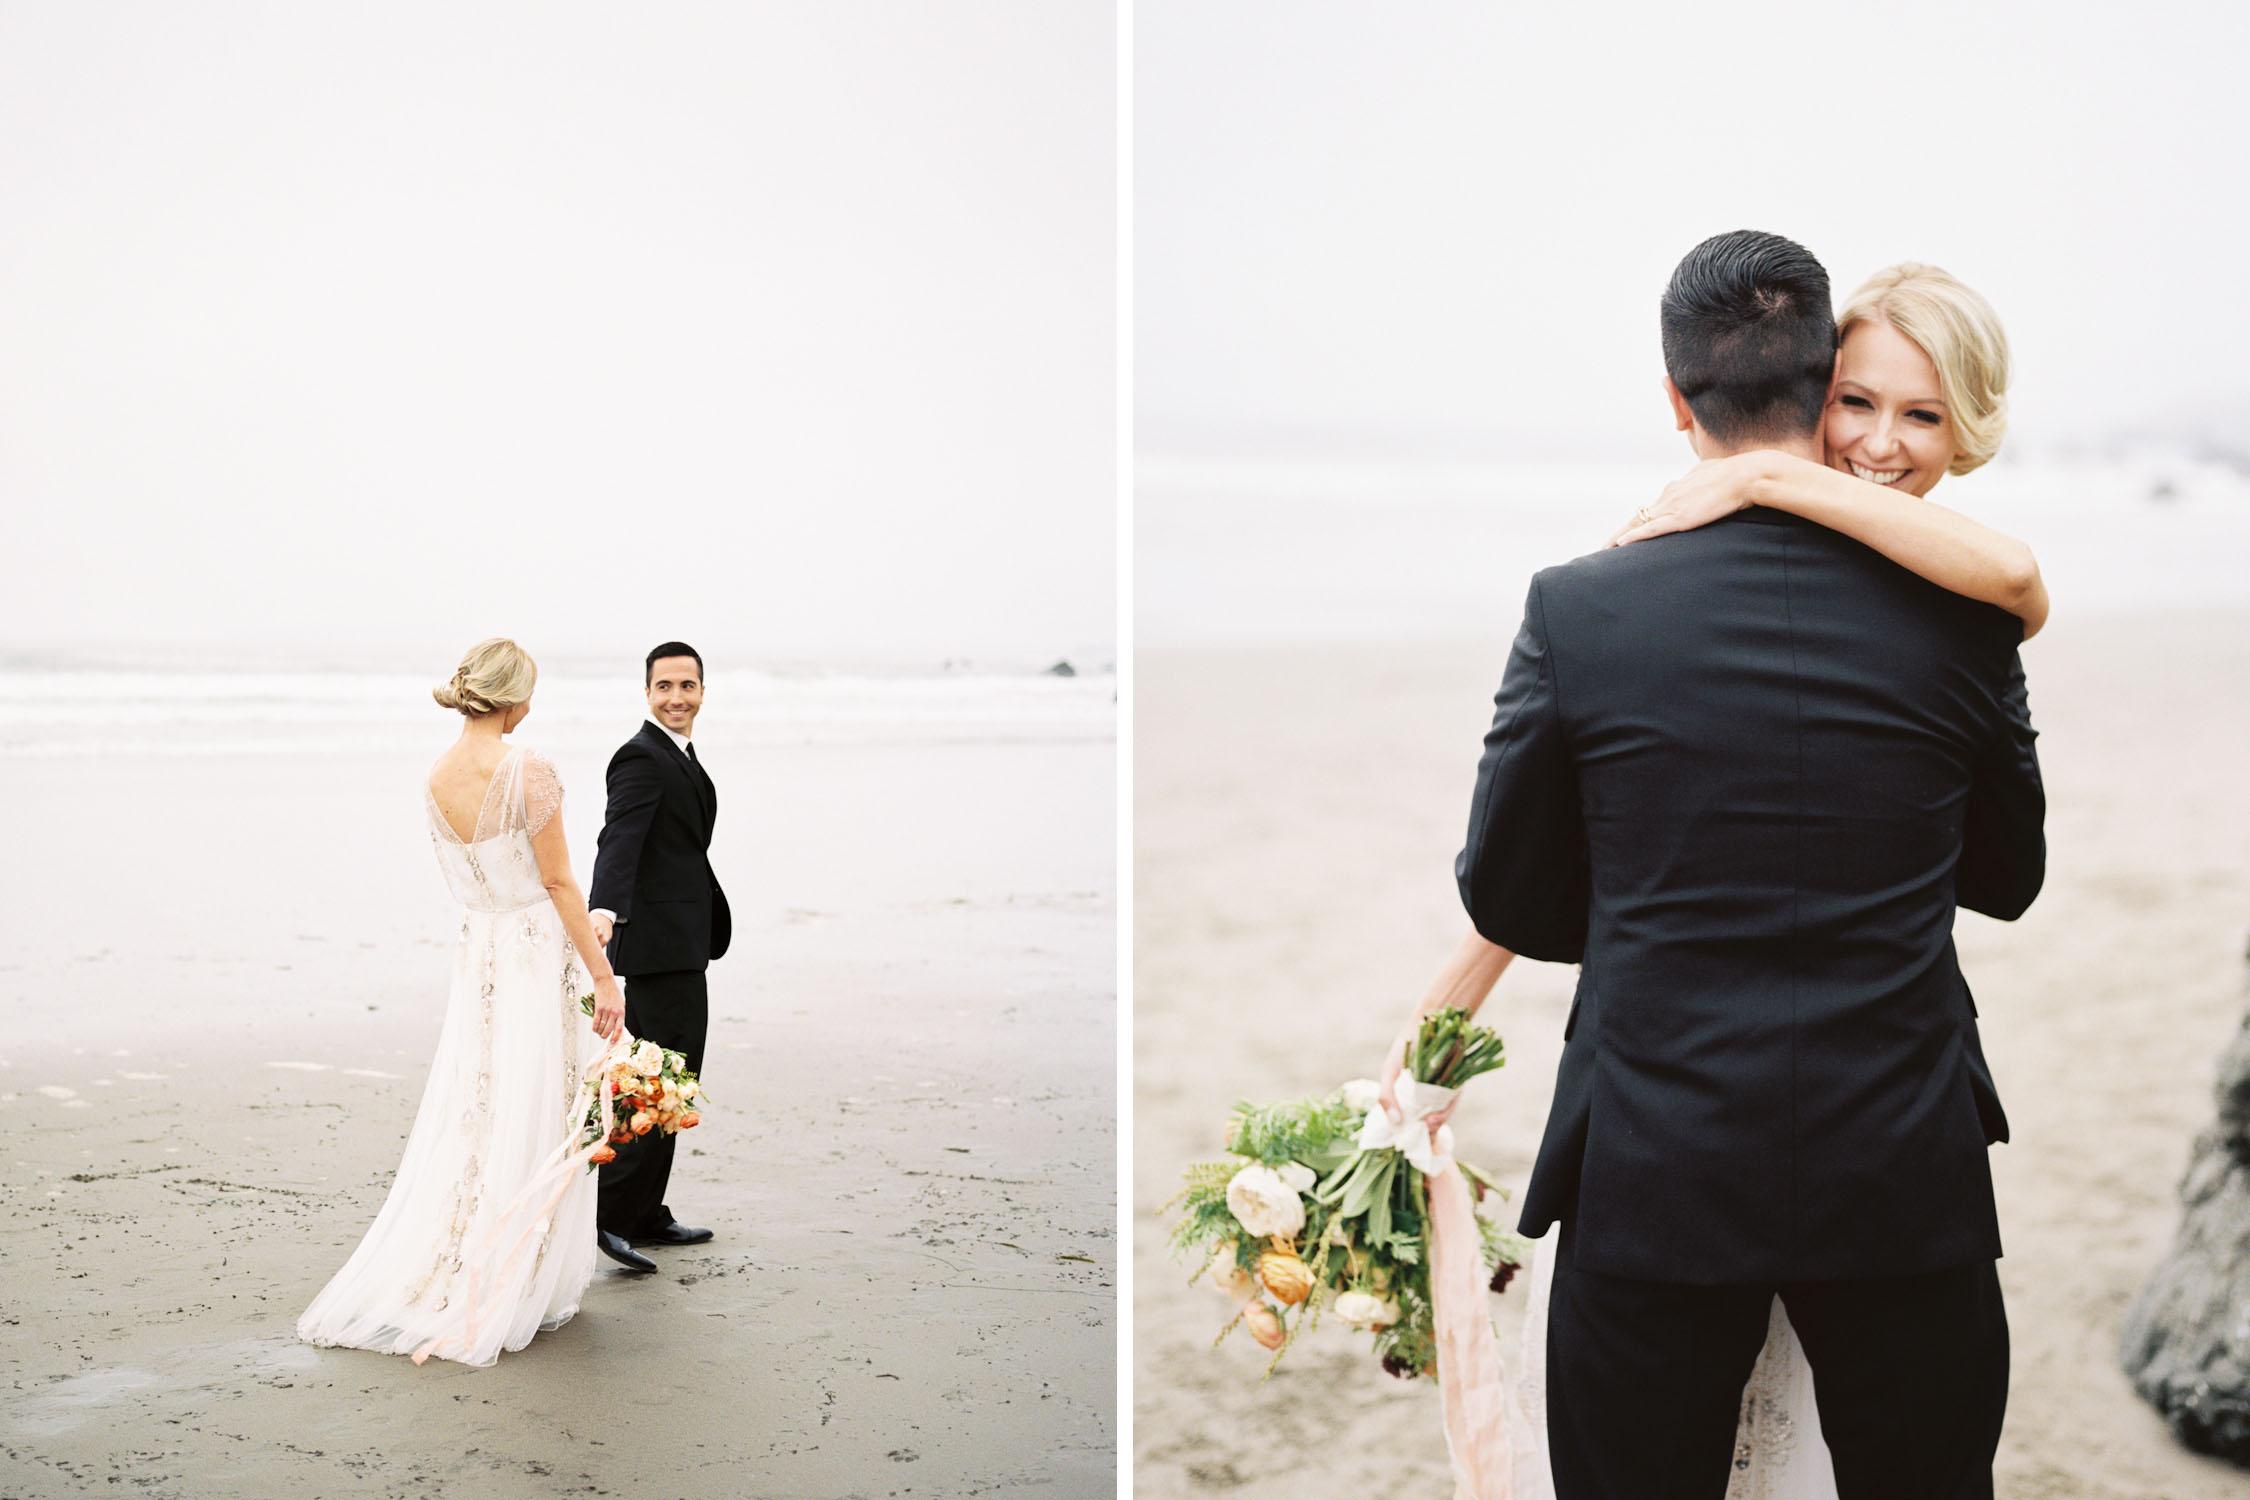 Bozeman-Montana-San Francisco-Bay Area-Wedding-Photographer-4.jpg